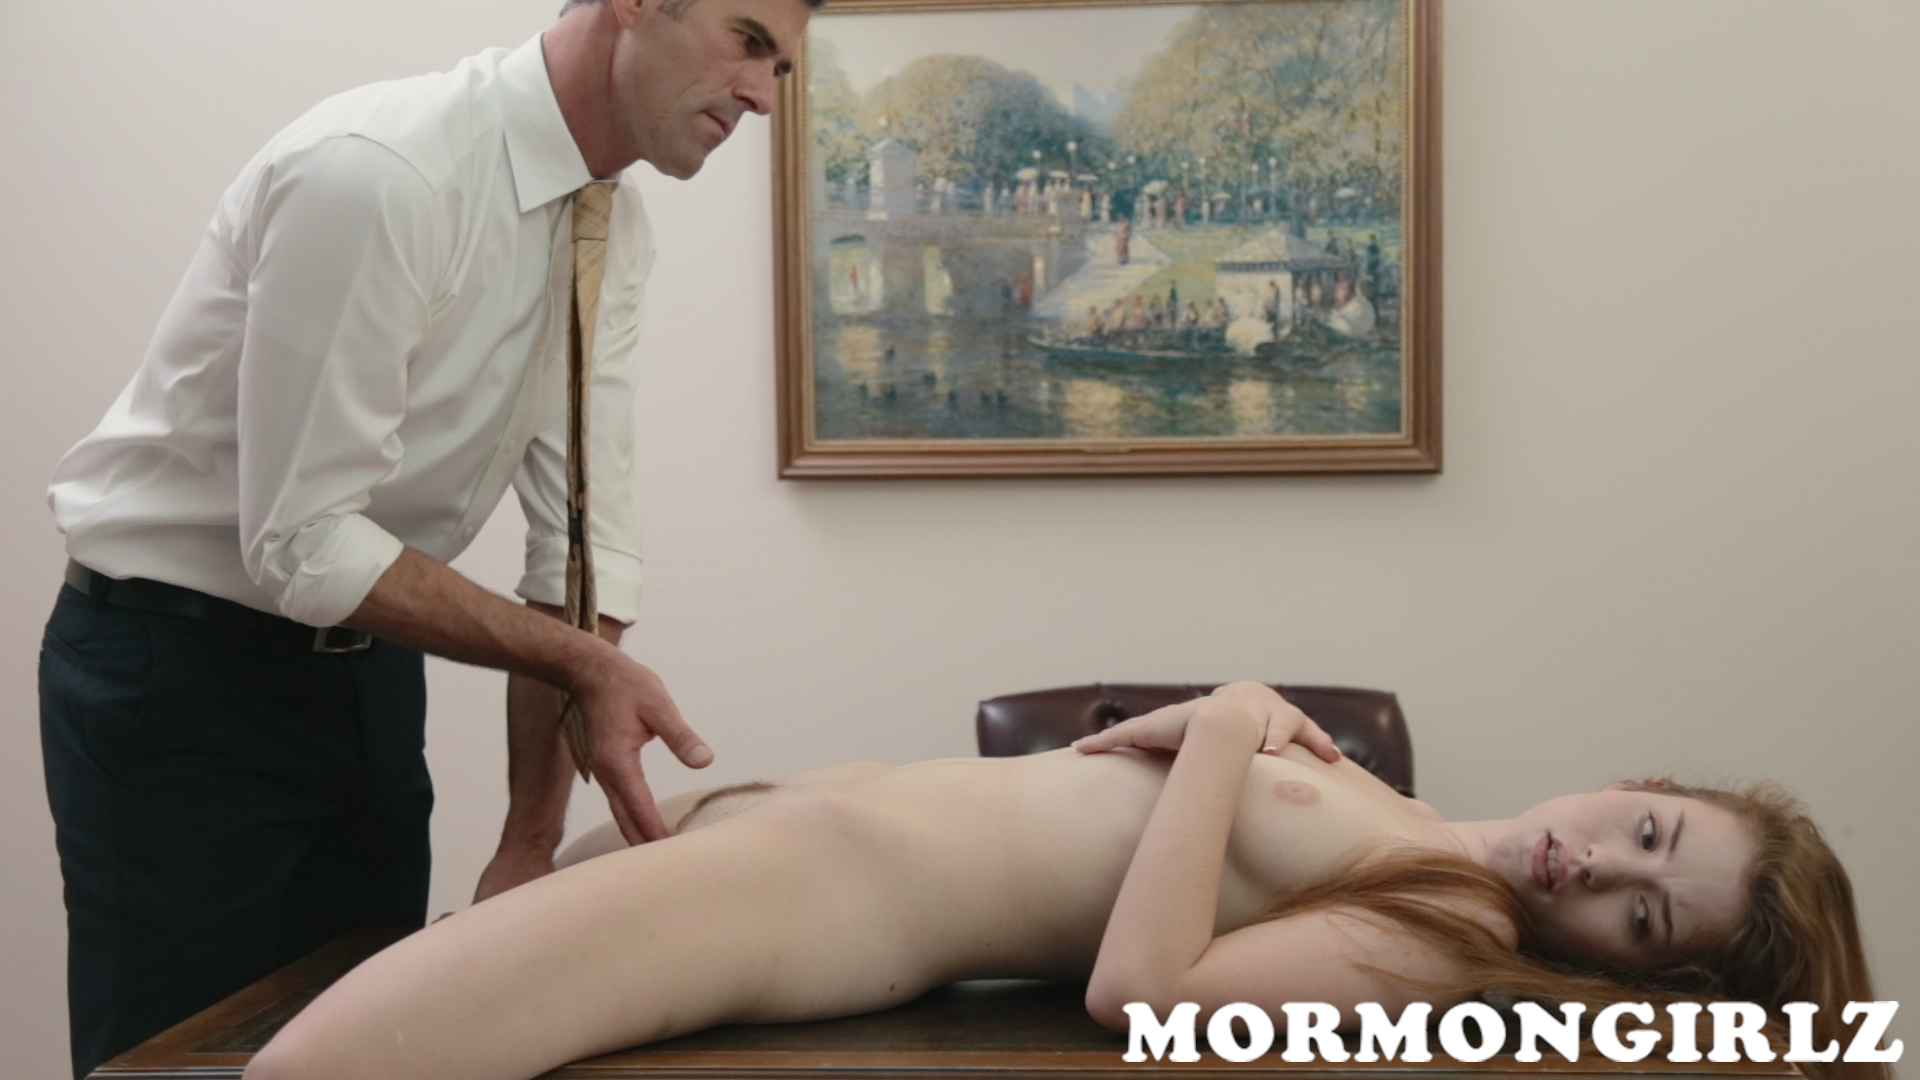 harry-porno-naked-girl-mormon-missionaries-lady-black